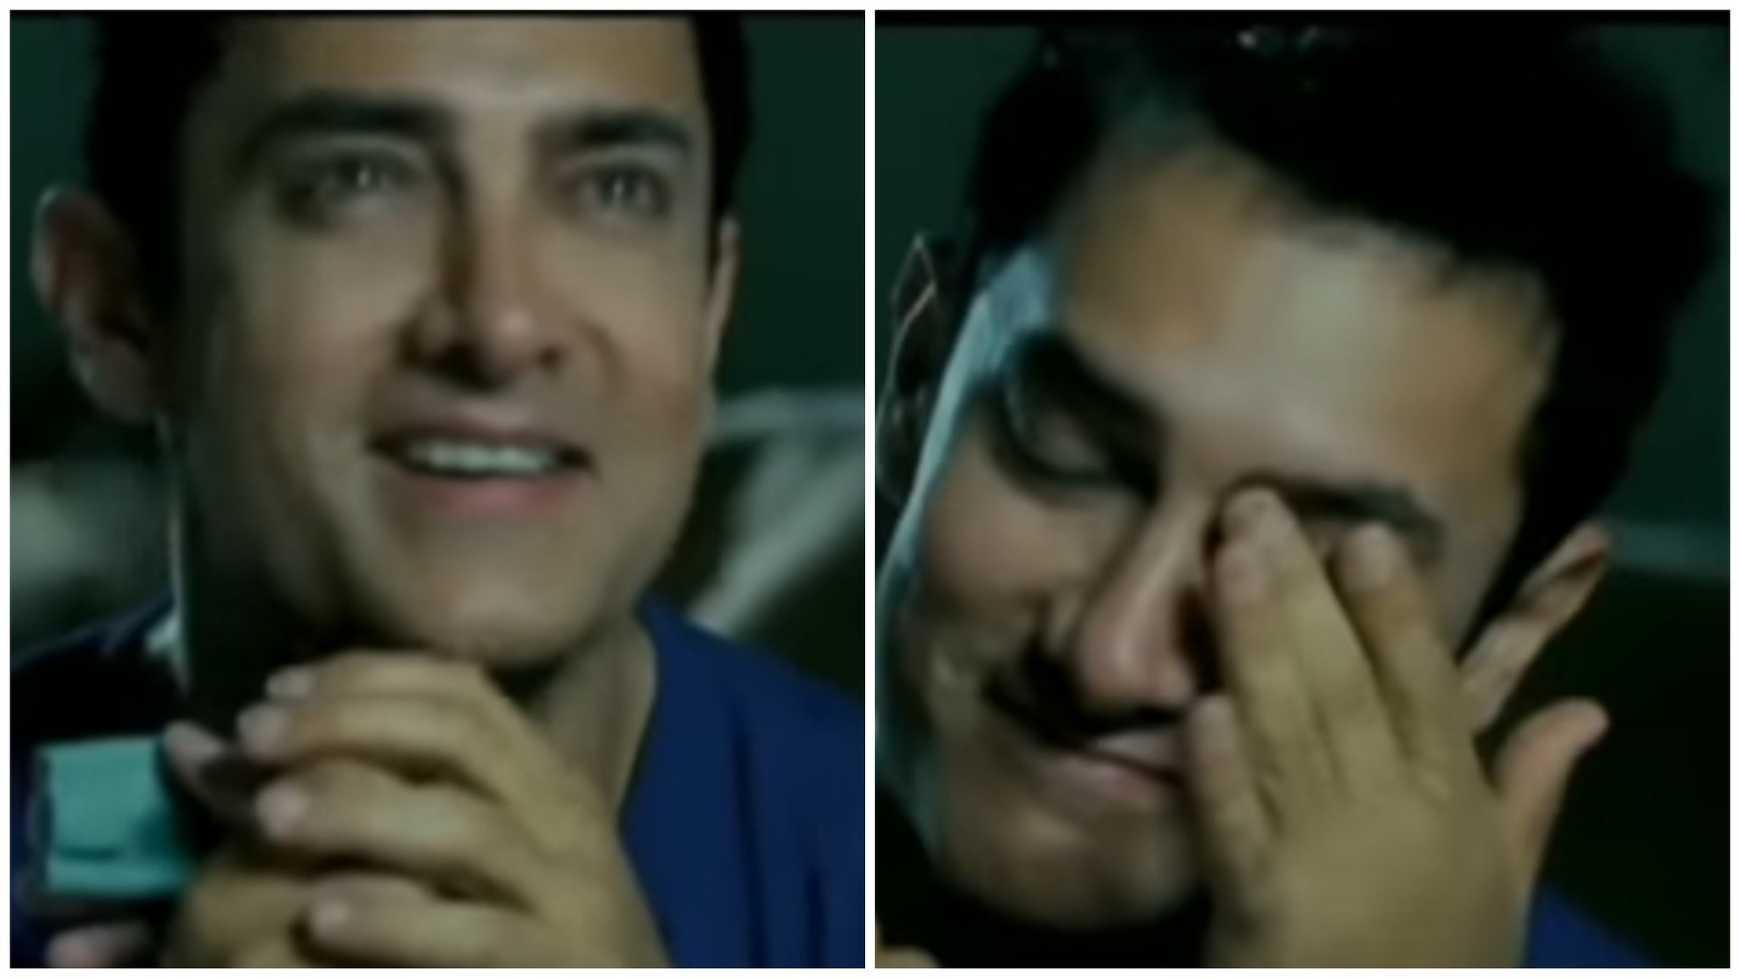 aamir khan smiling vs crying meme template 3 idiots